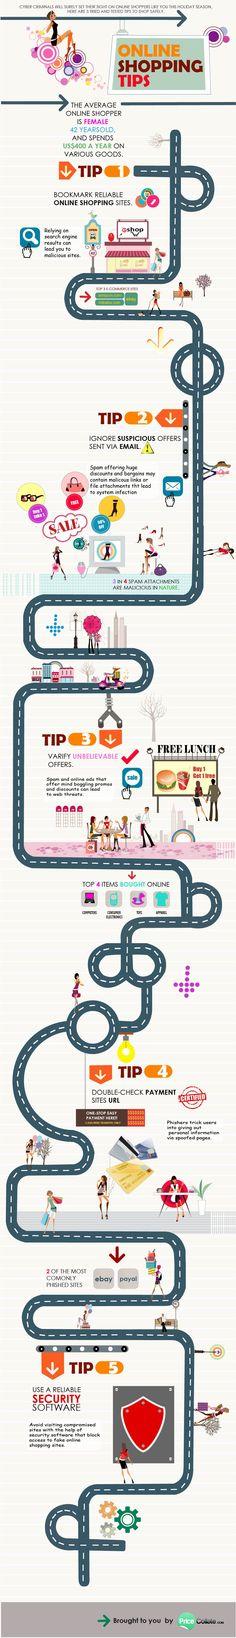 5 Best Tips for Safe Online Shopping (Infographic) Inbound Marketing, Internet Marketing, Social Media Marketing, Digital Marketing, Brit Milah, Online Shopping Websites, Online Shopping For Women, E Commerce, Bar Mitzvah